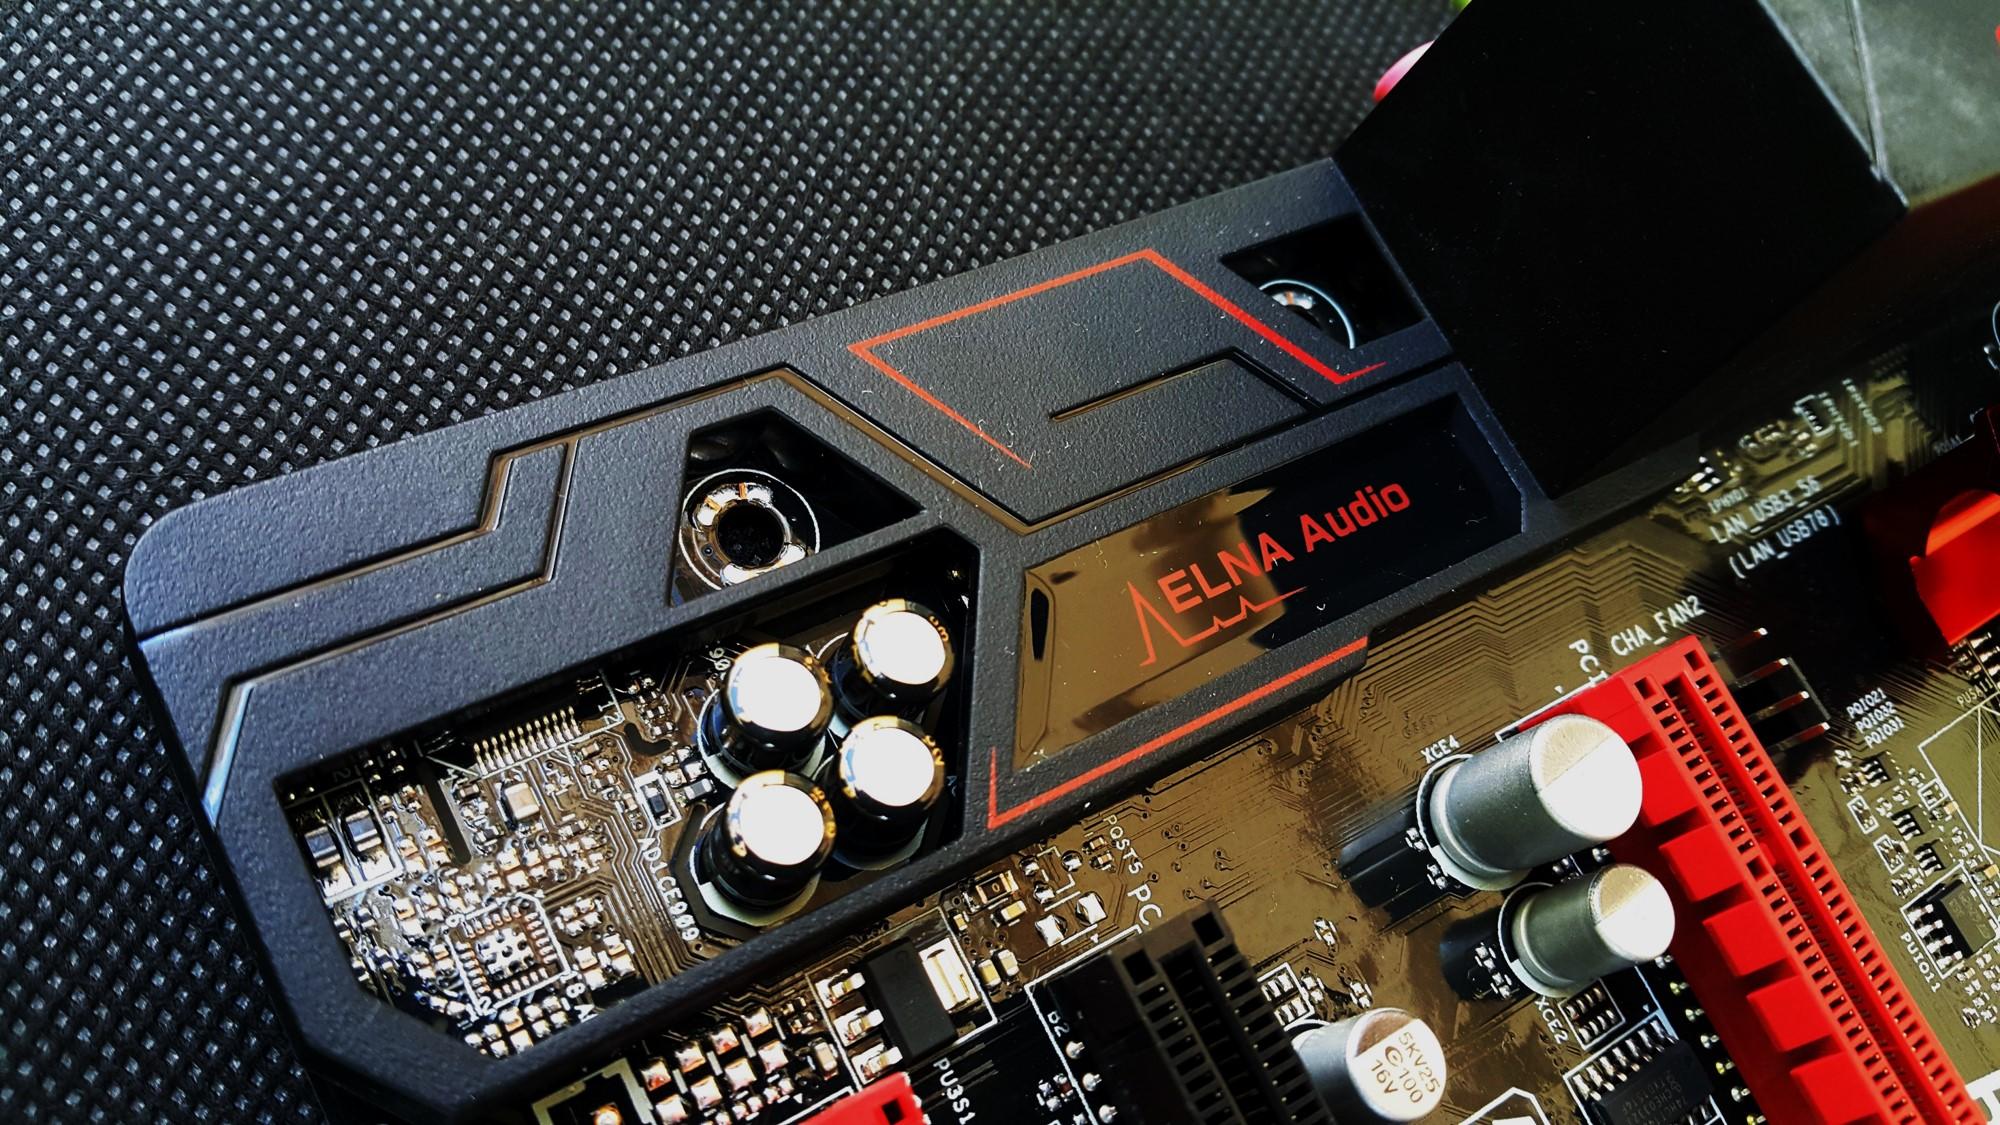 Asrock B150M Combo G ELNA Audio